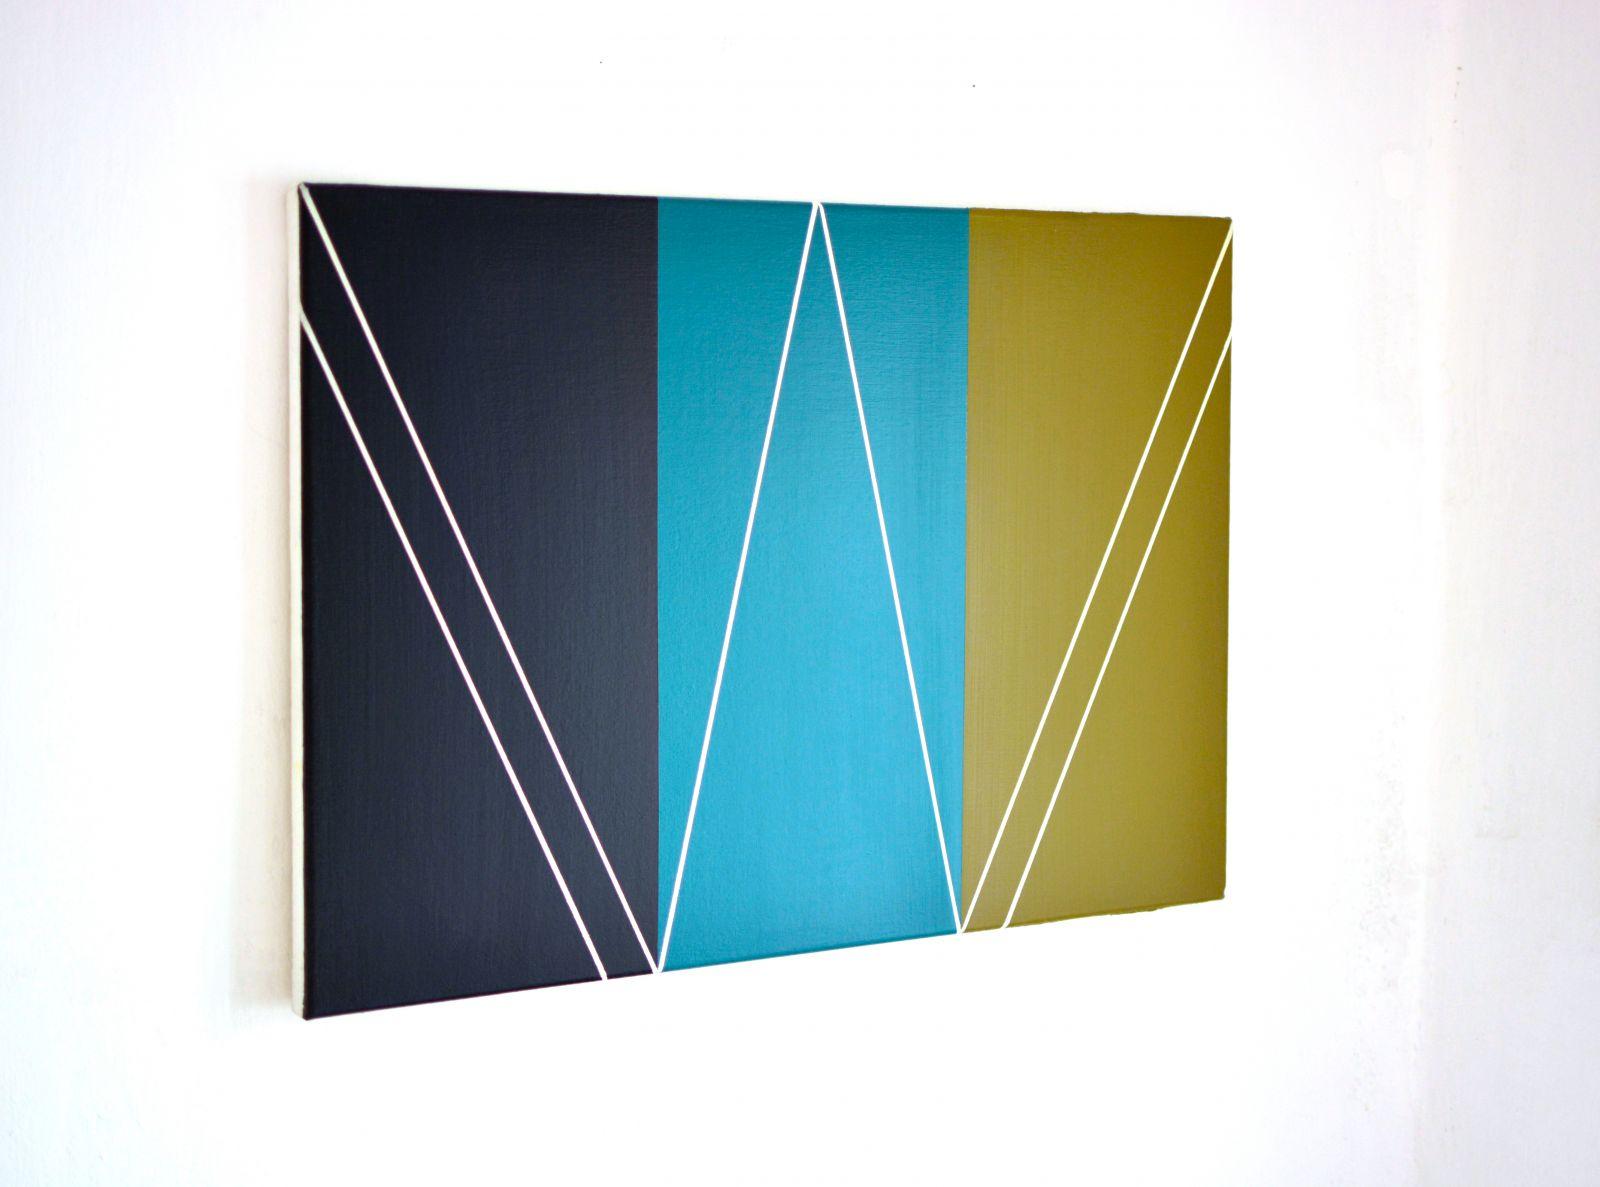 Illmitz-Lineatur vor drei Farbfeldern